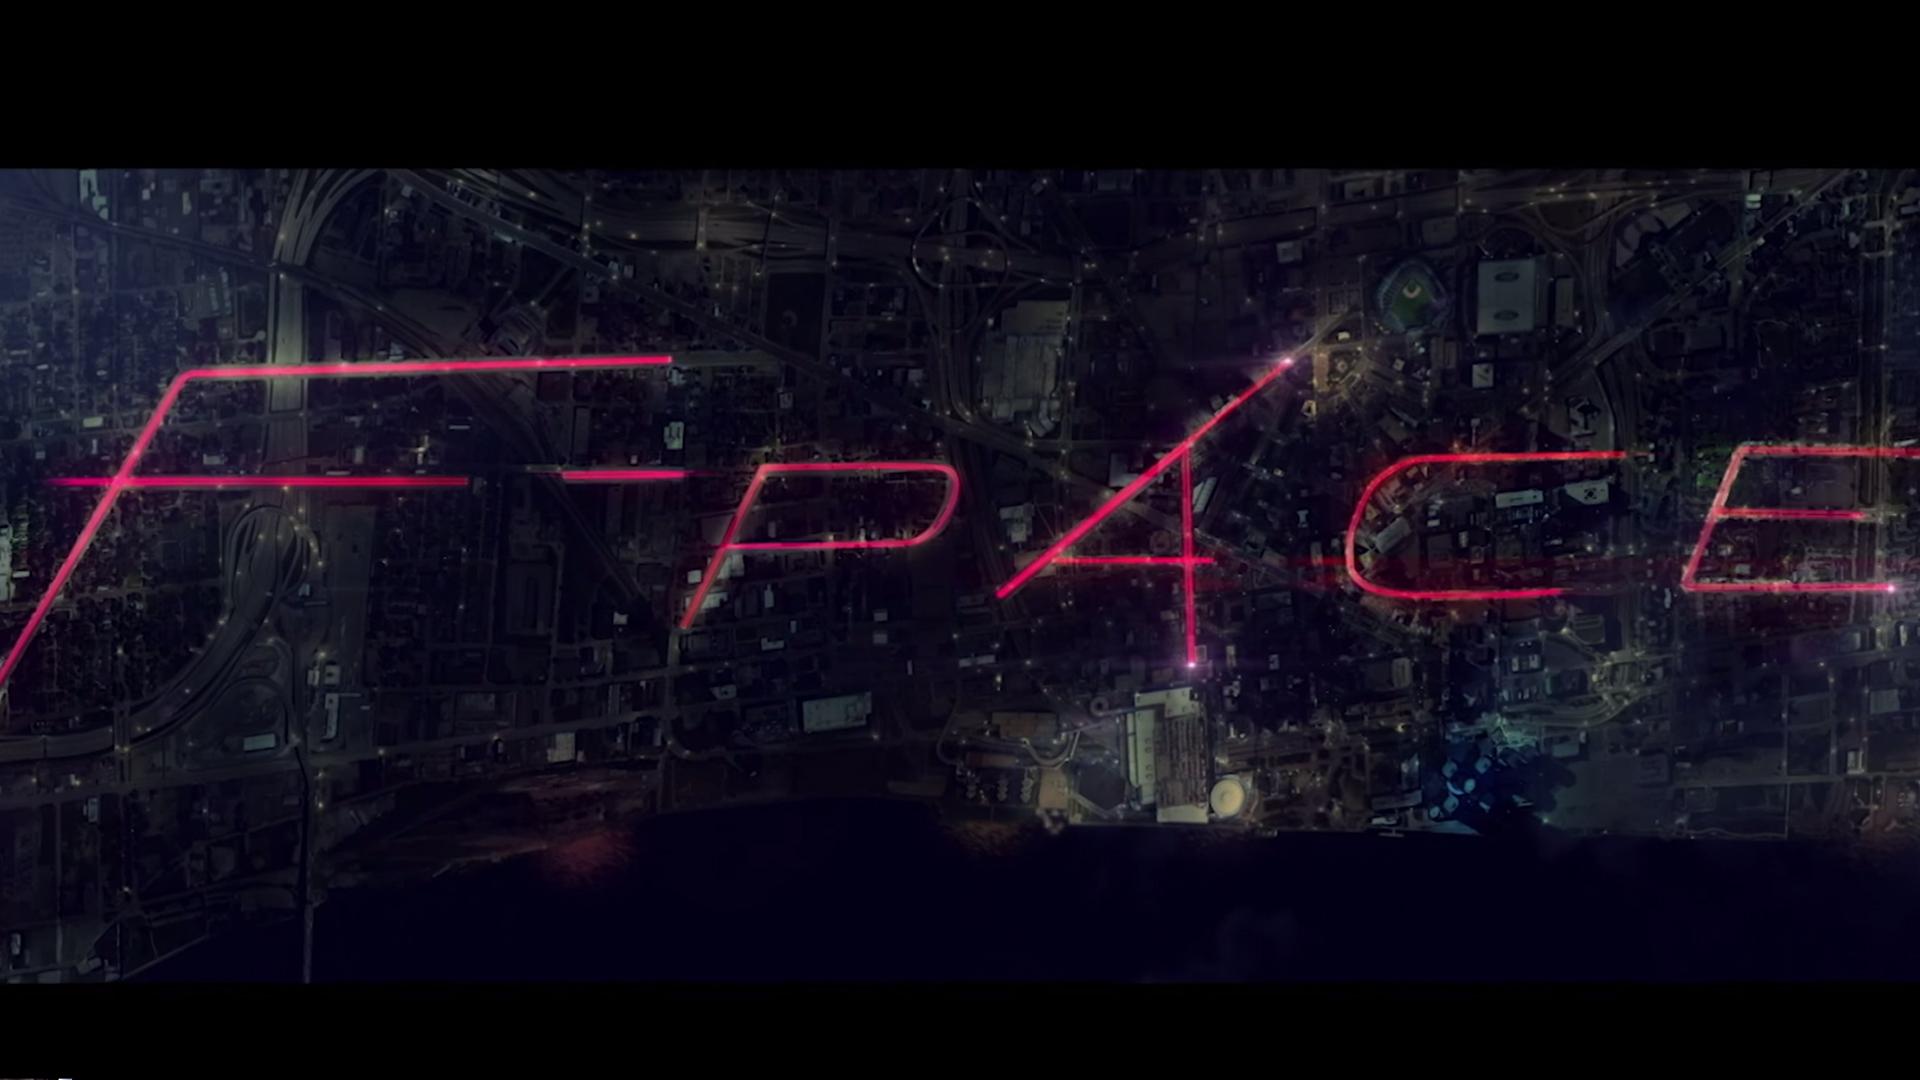 Jaguar F-PACE - teaser